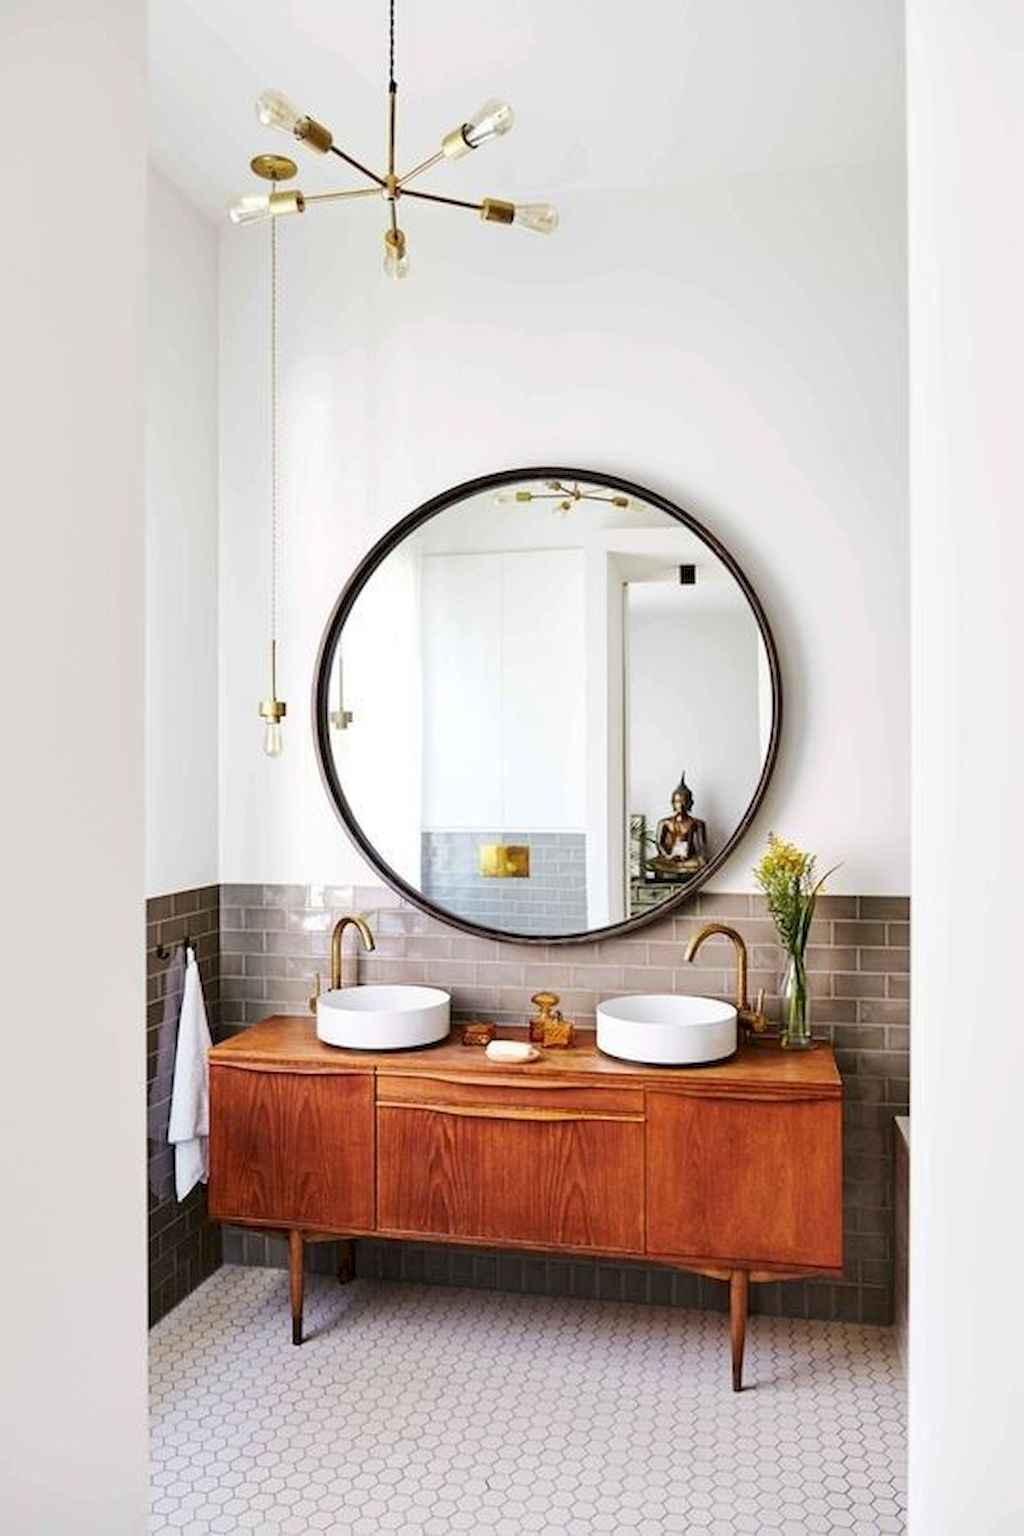 Mid century bathroom decoration ideas 32 homespecially for Mid century bathroom ideas